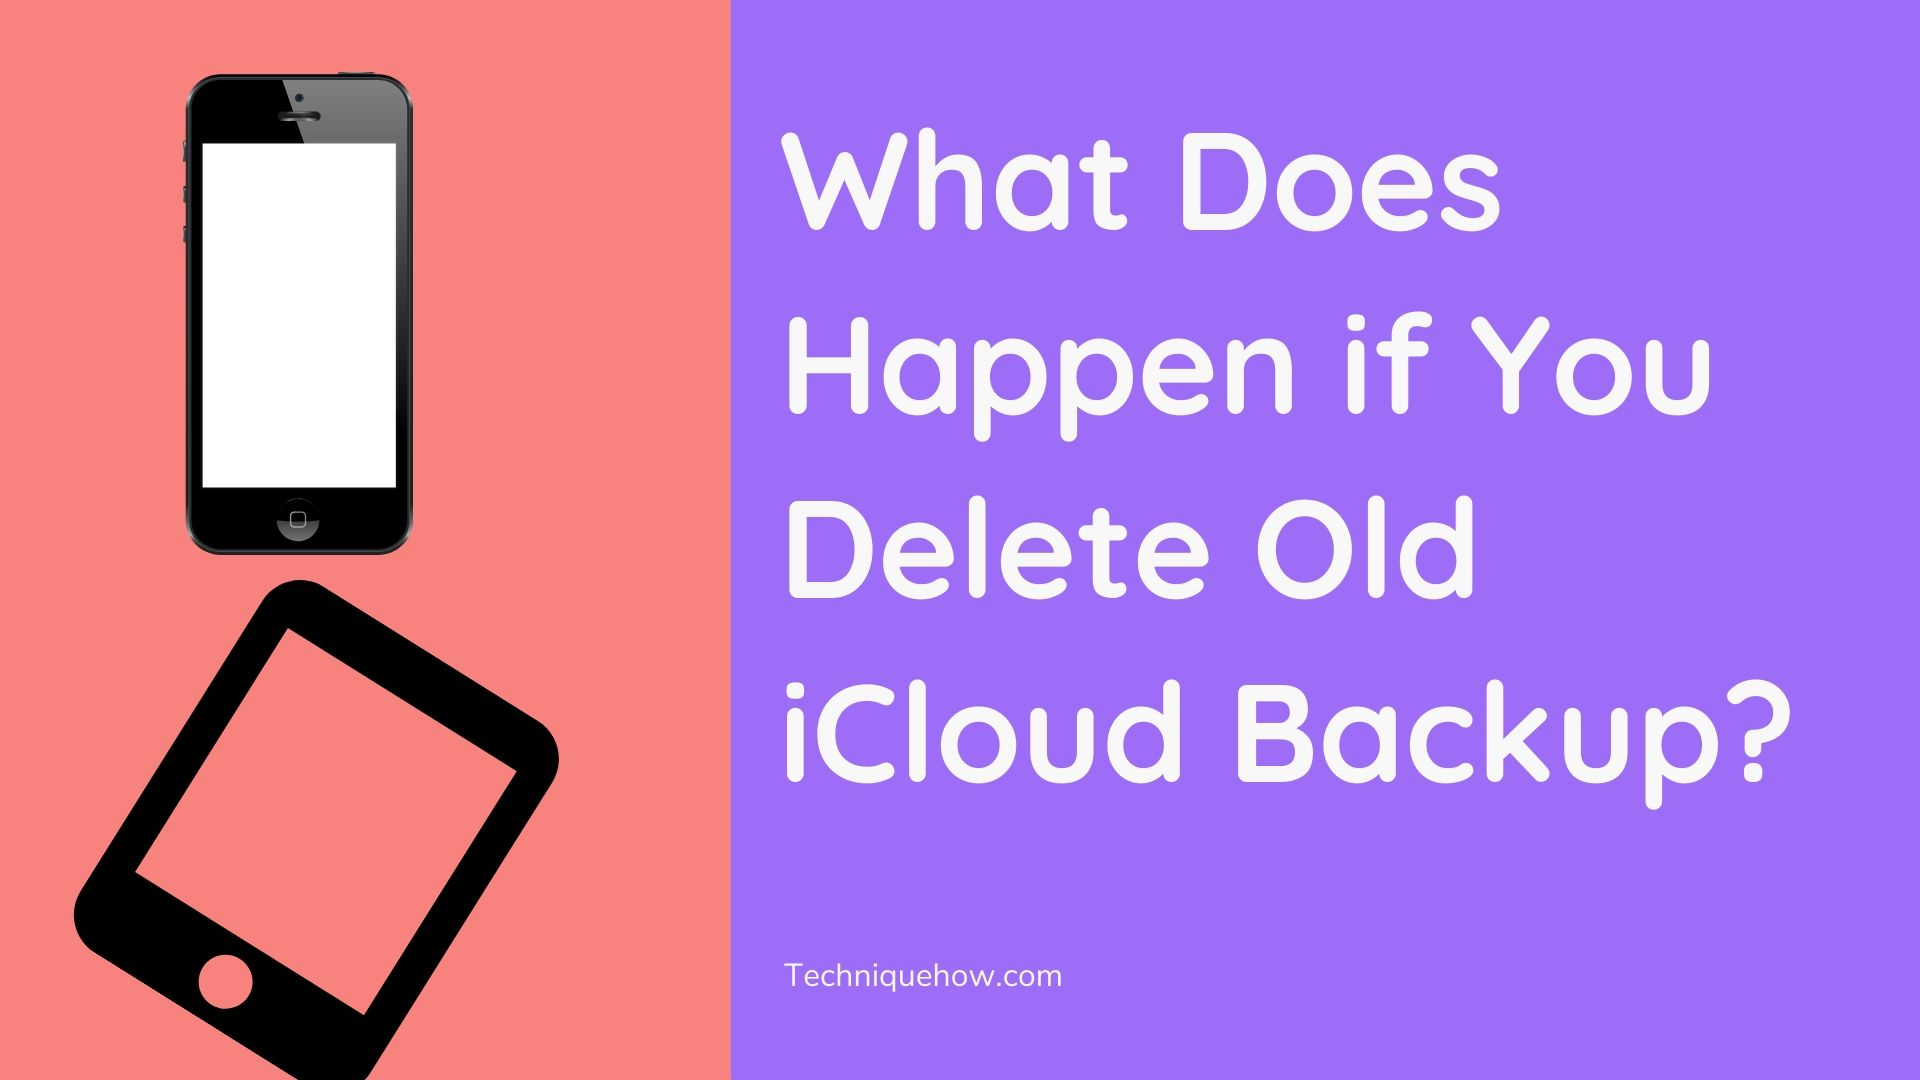 Delete Old iCloud Backup